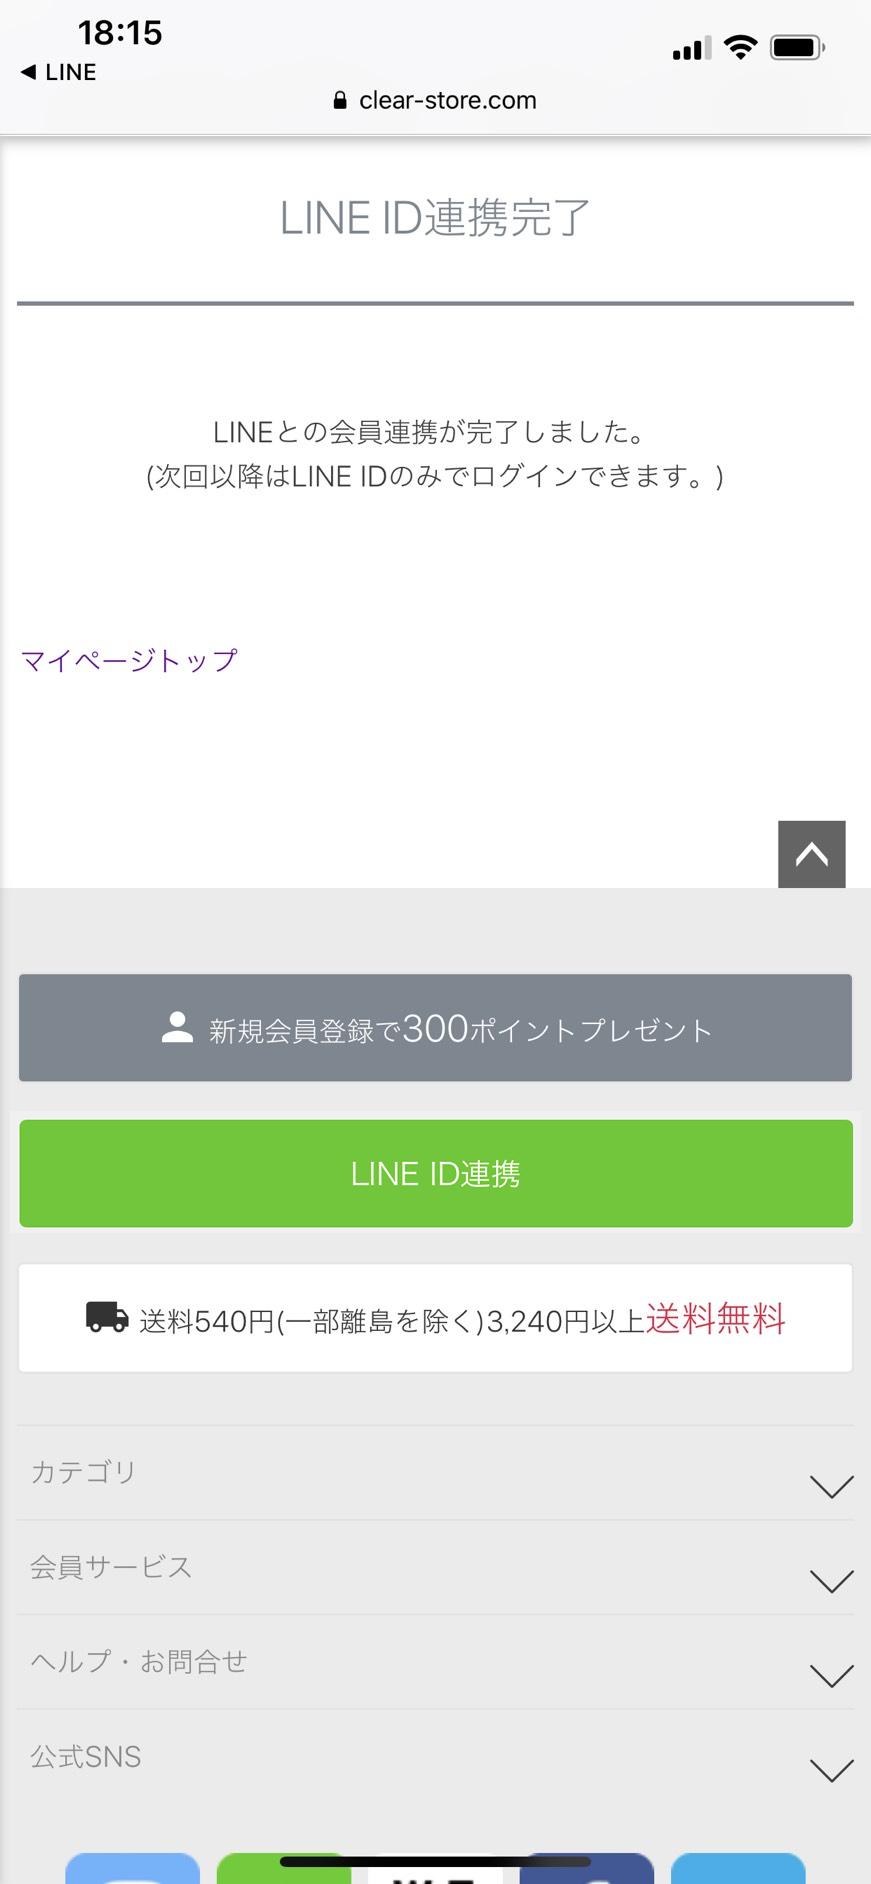 LINE ID連携 STEP5